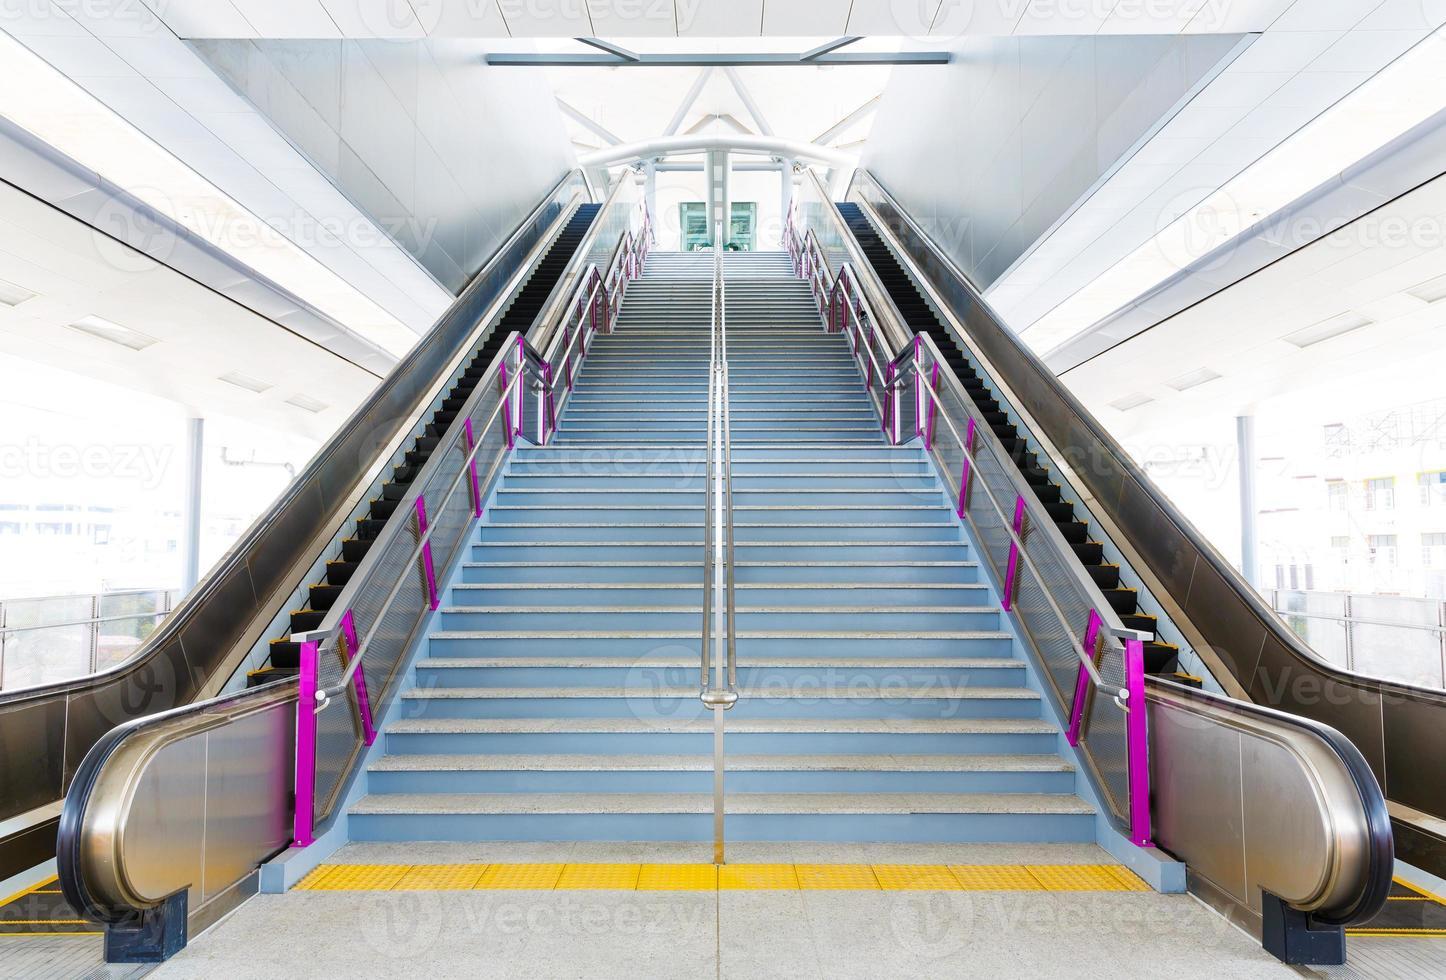 escada rolante e escadas foto